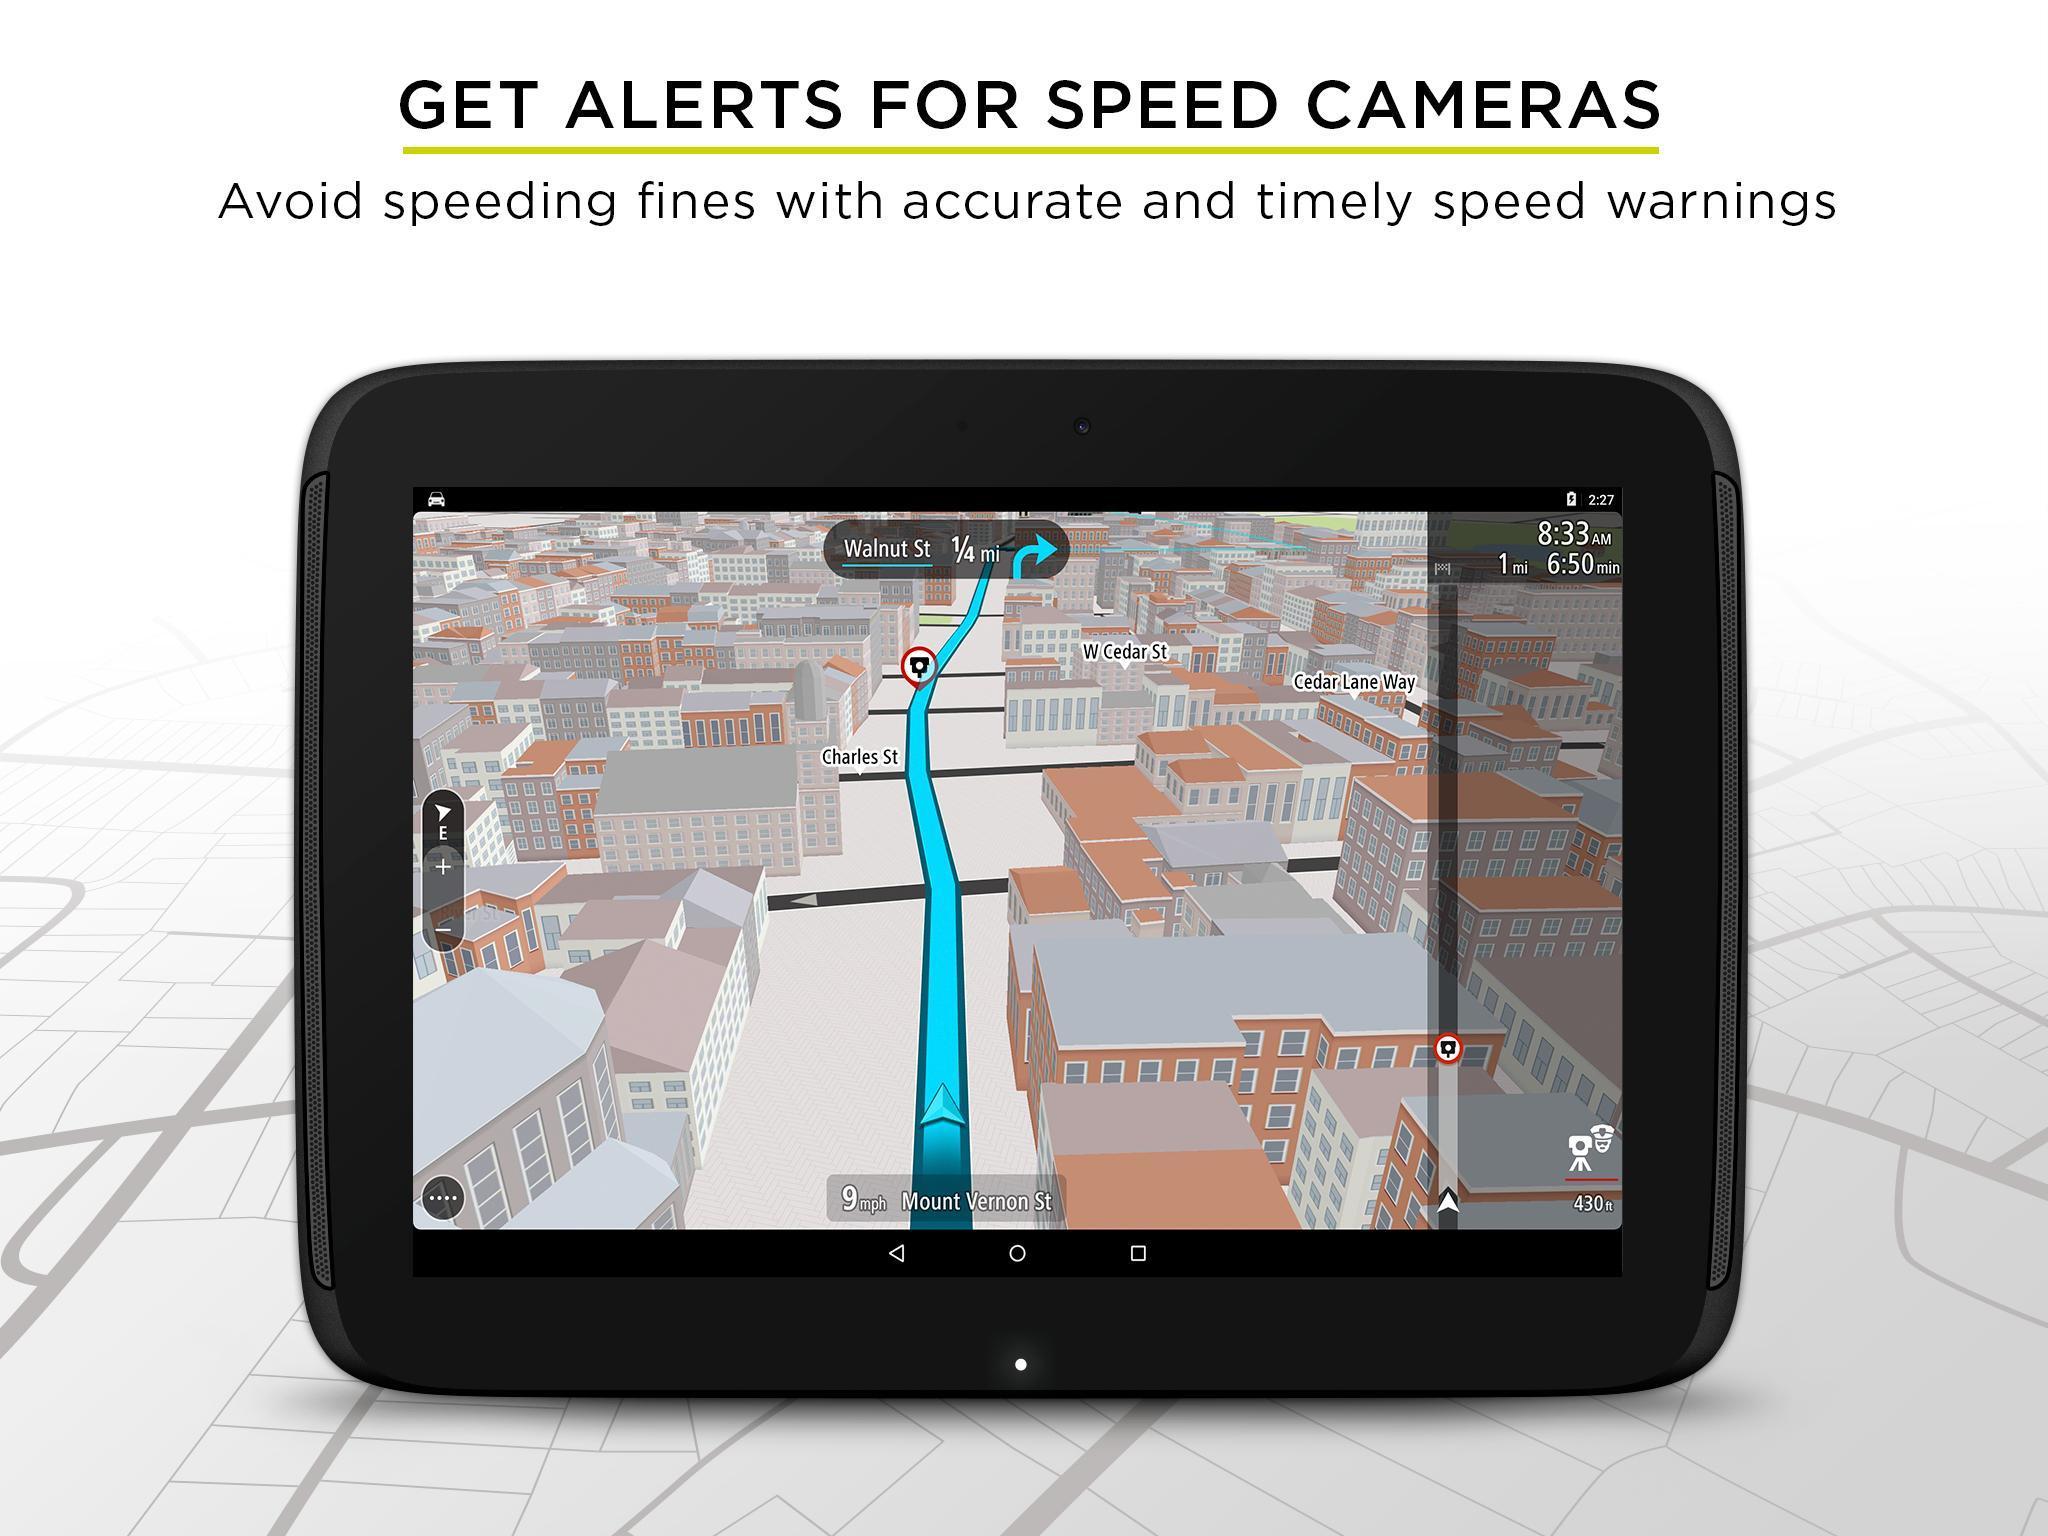 TomTom GPS Navigation - Live Traffic Alerts & Maps 2.0.4 Screenshot 12